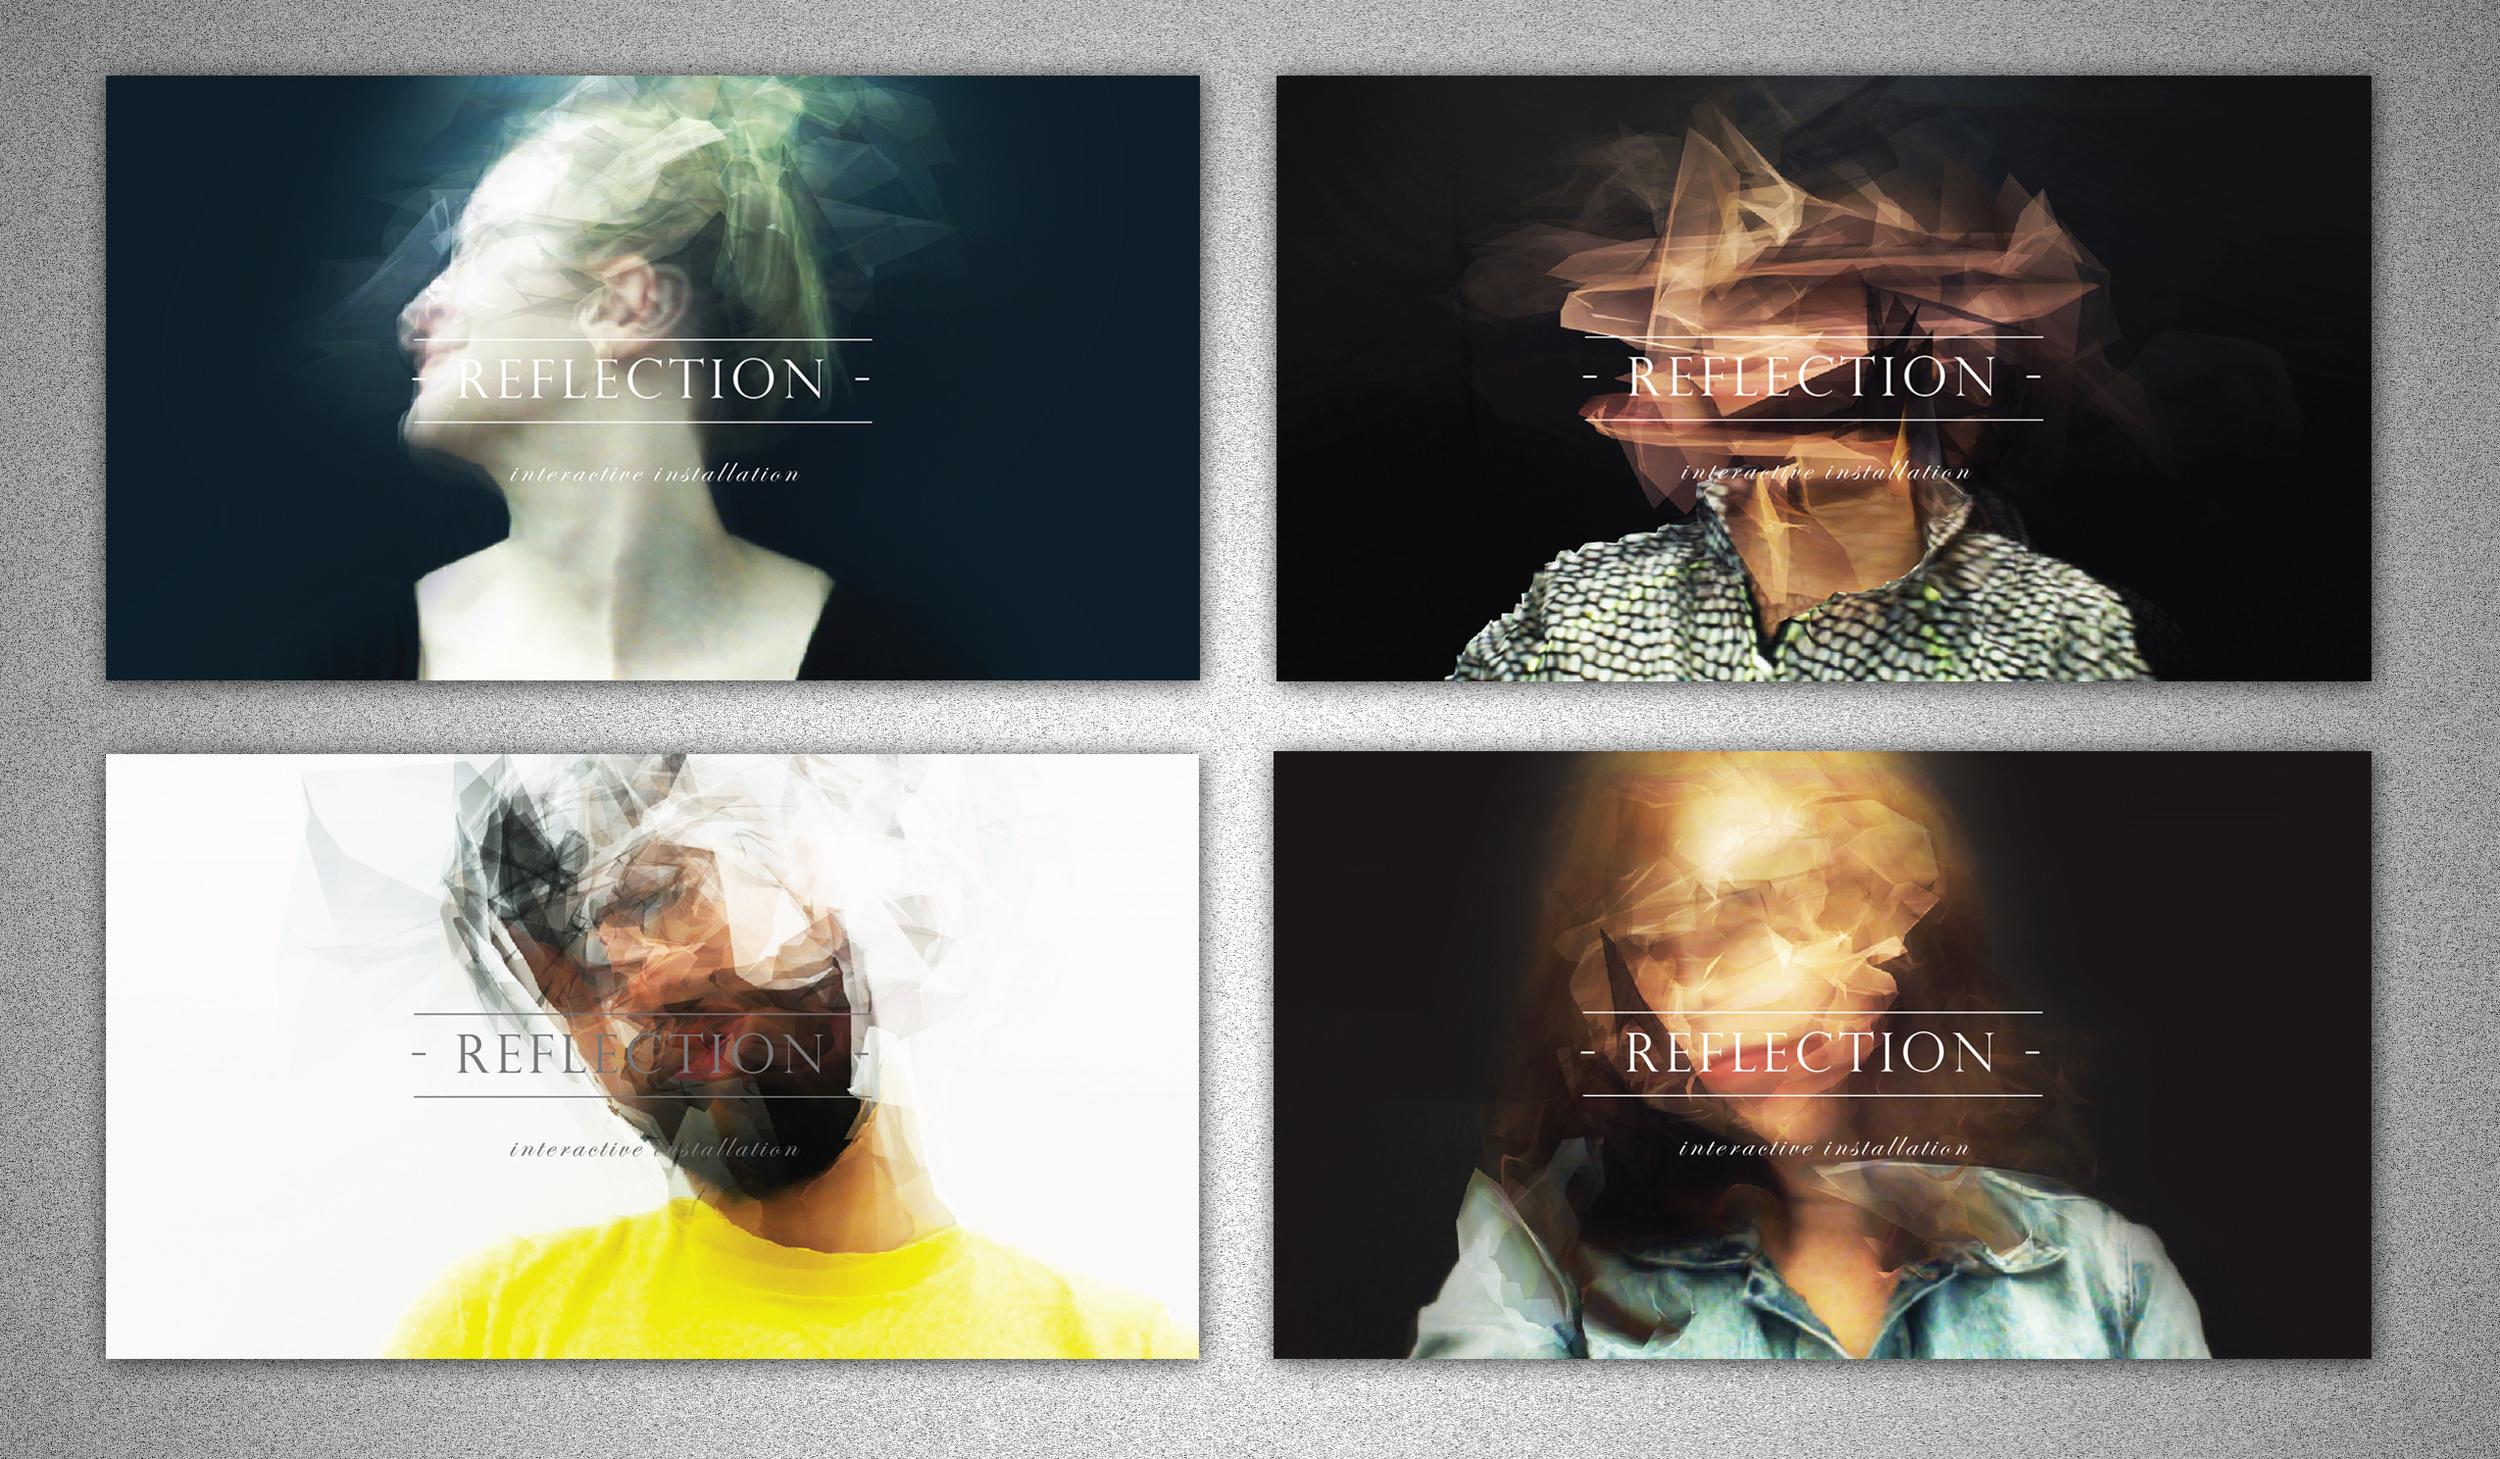 Postcard design for my thesis project [Reflection] People in the images: Kamilla Kielbowska, Joori Lee,Gustavo Faria, Maxine Kim